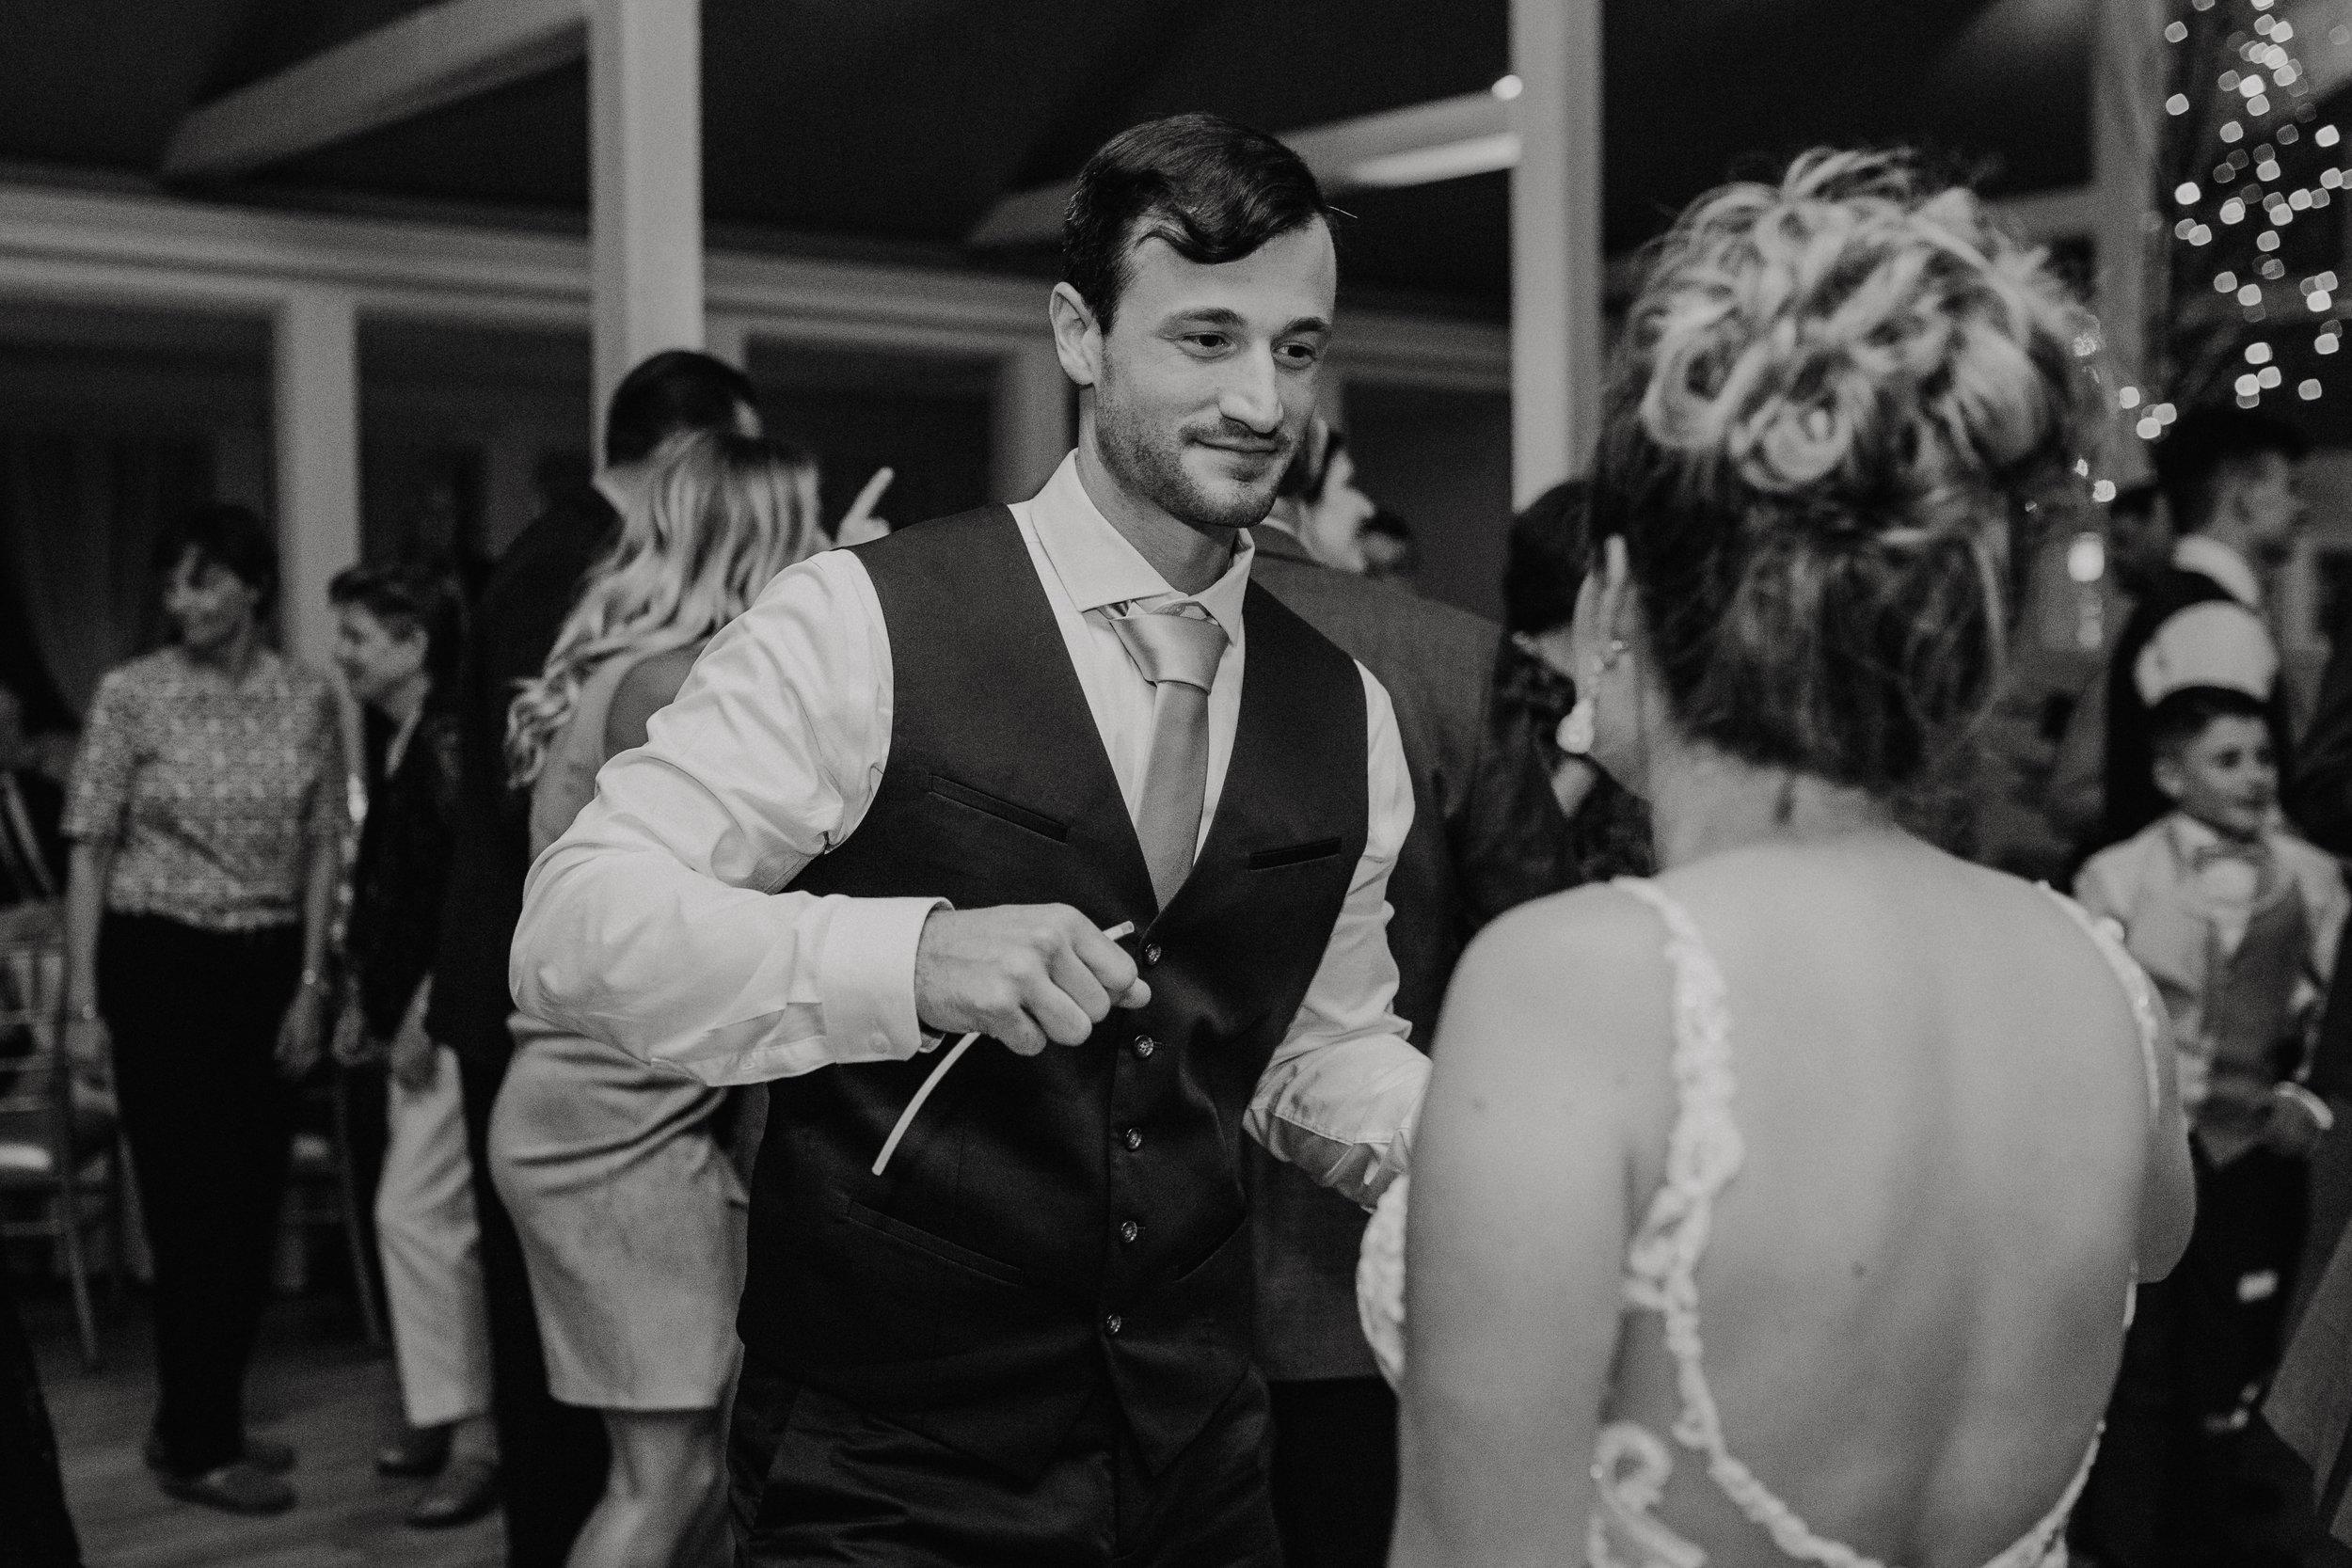 old_daley_on_crooked_lake_wedding_-114.jpg